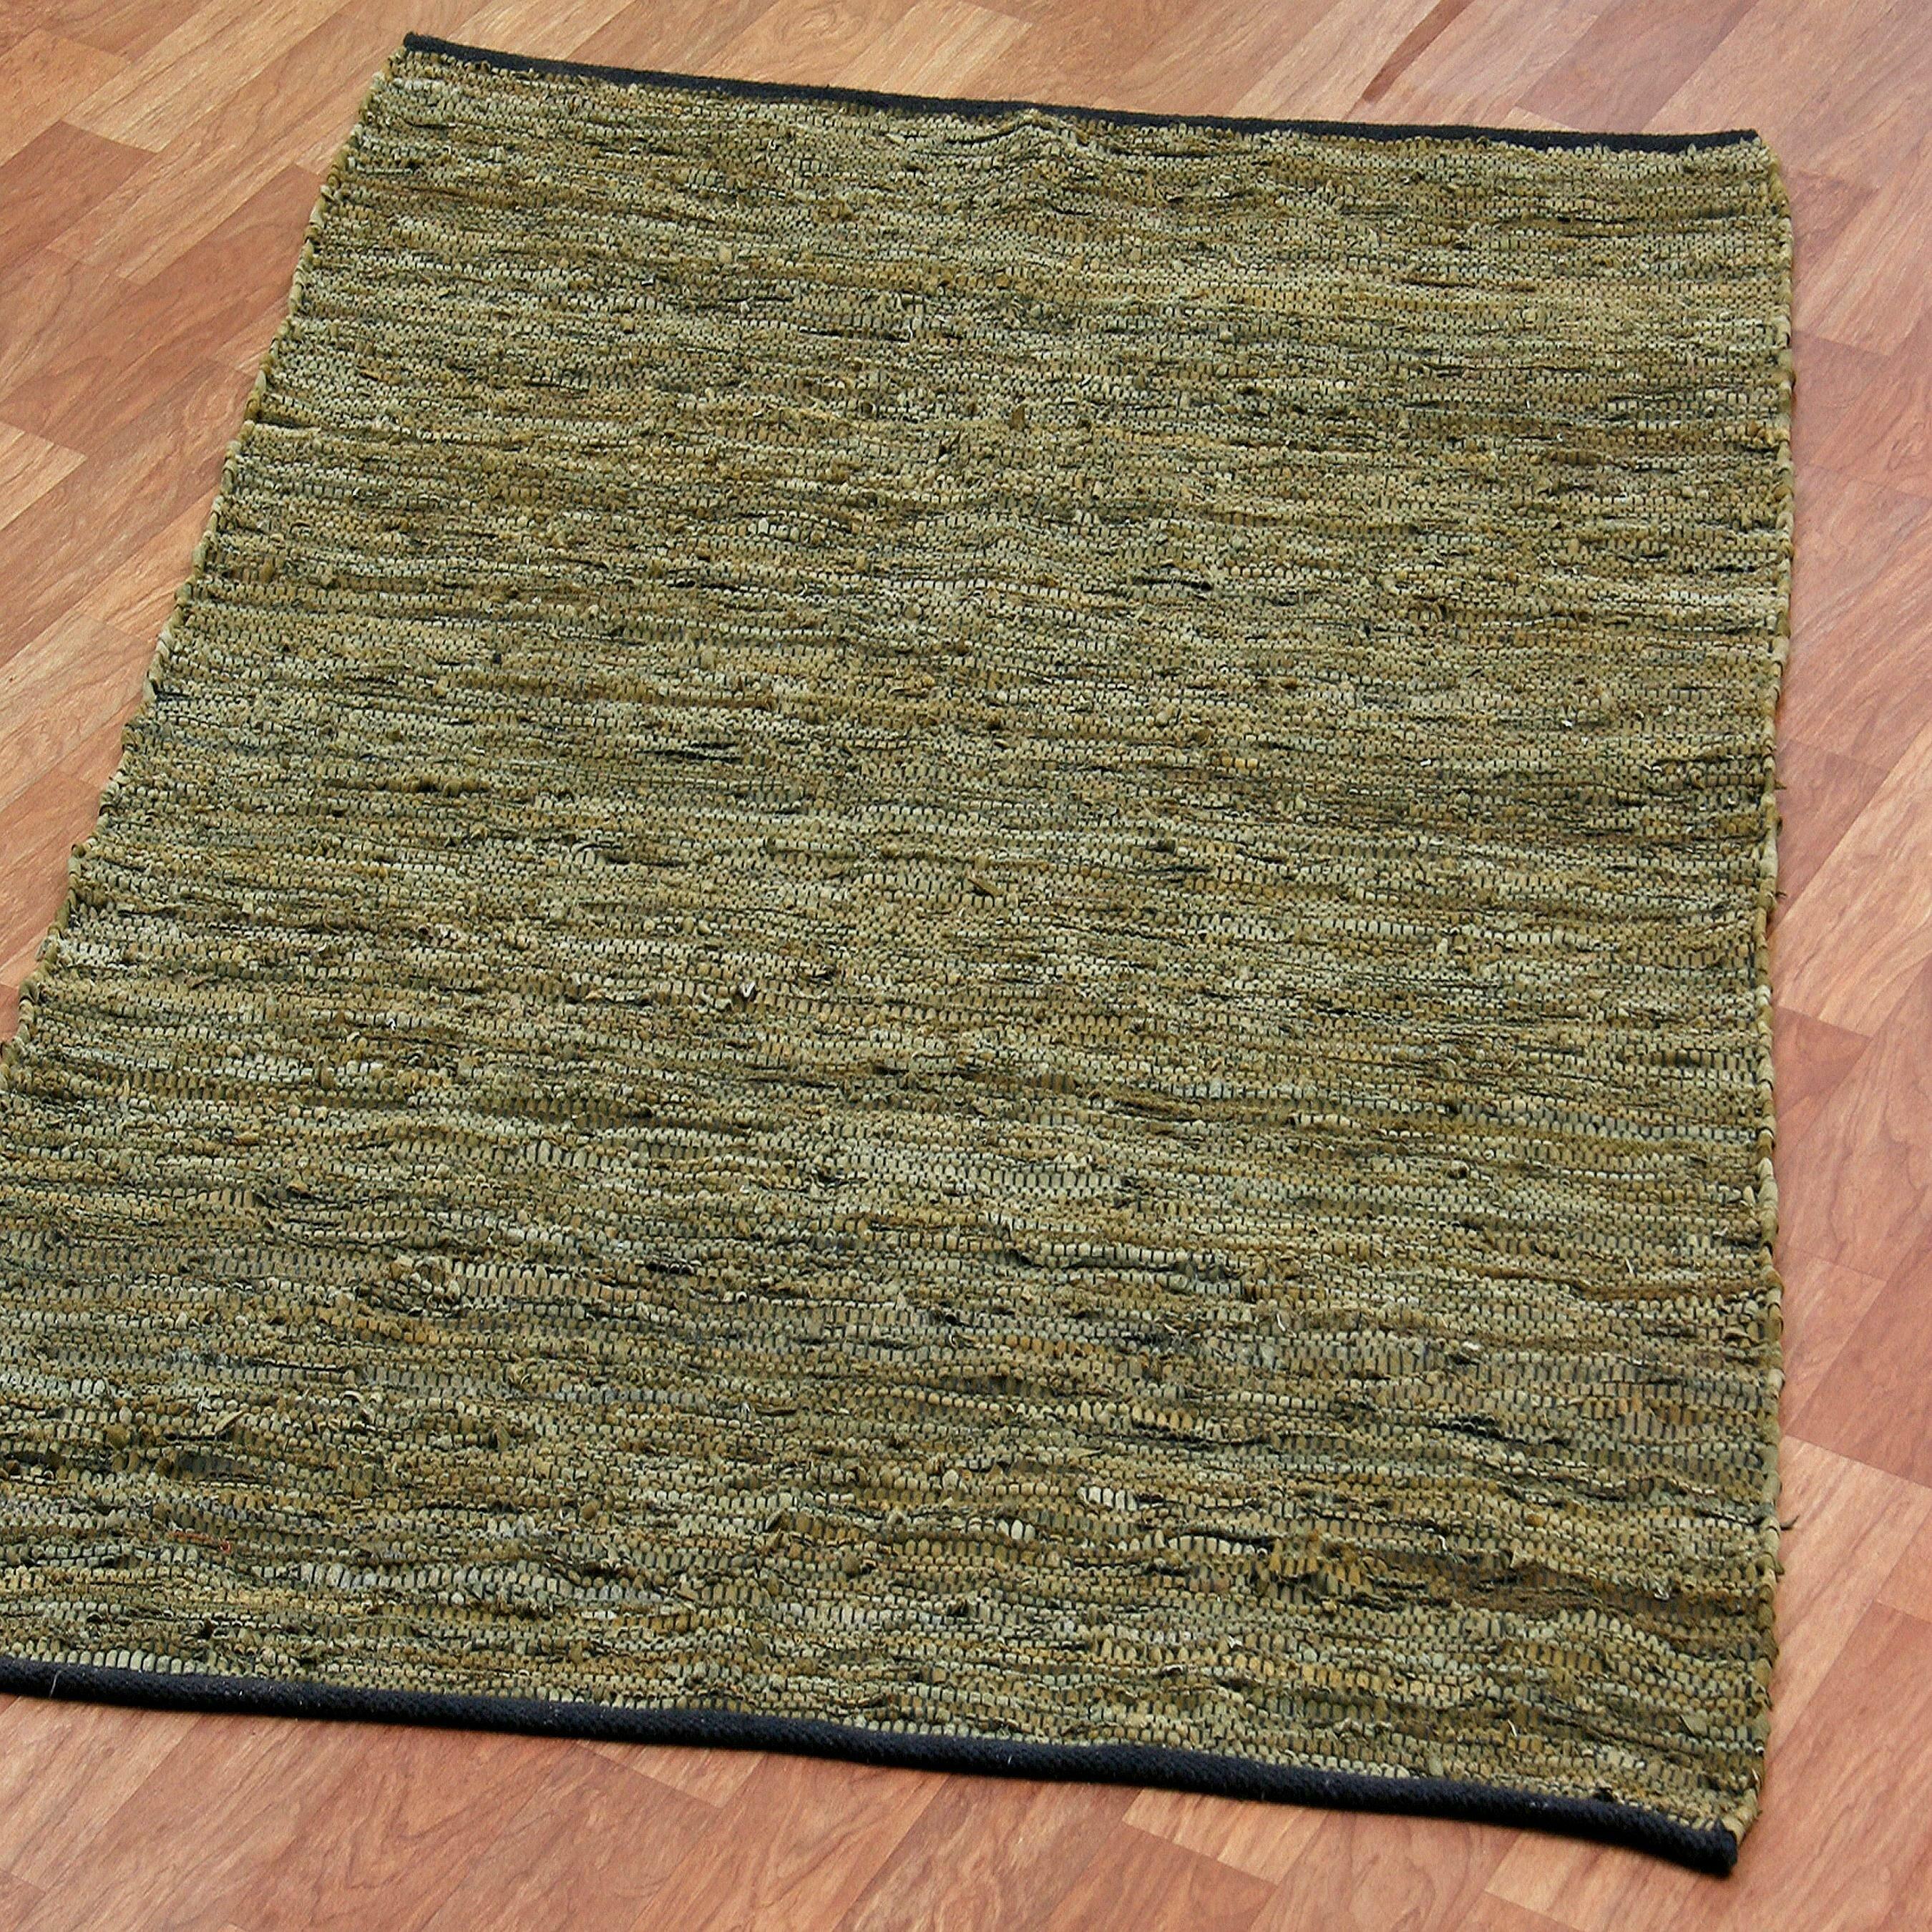 St. Croix Matador Leather Chindi Green Rug & Reviews